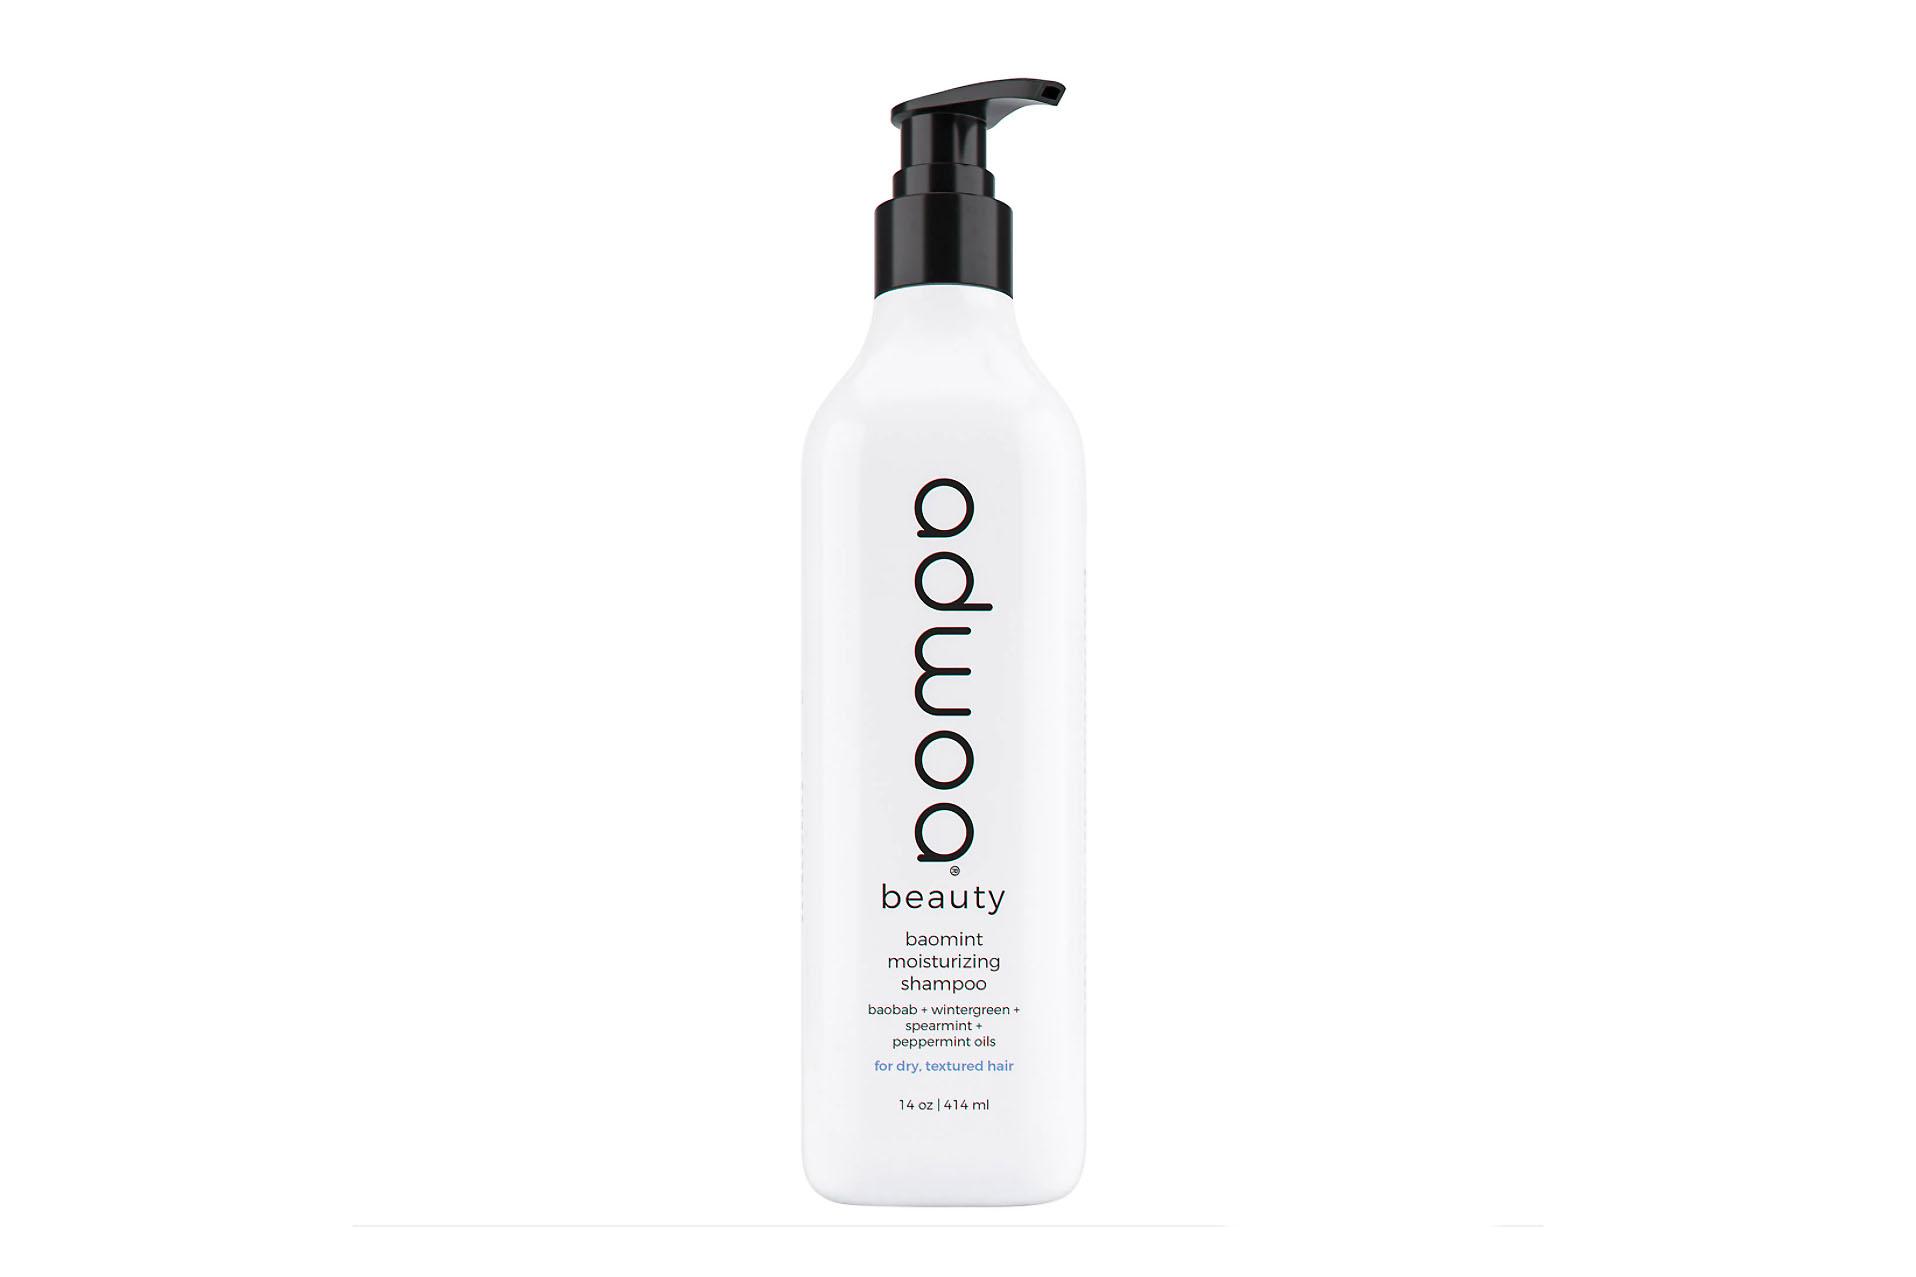 adwoa natural hair products for fall